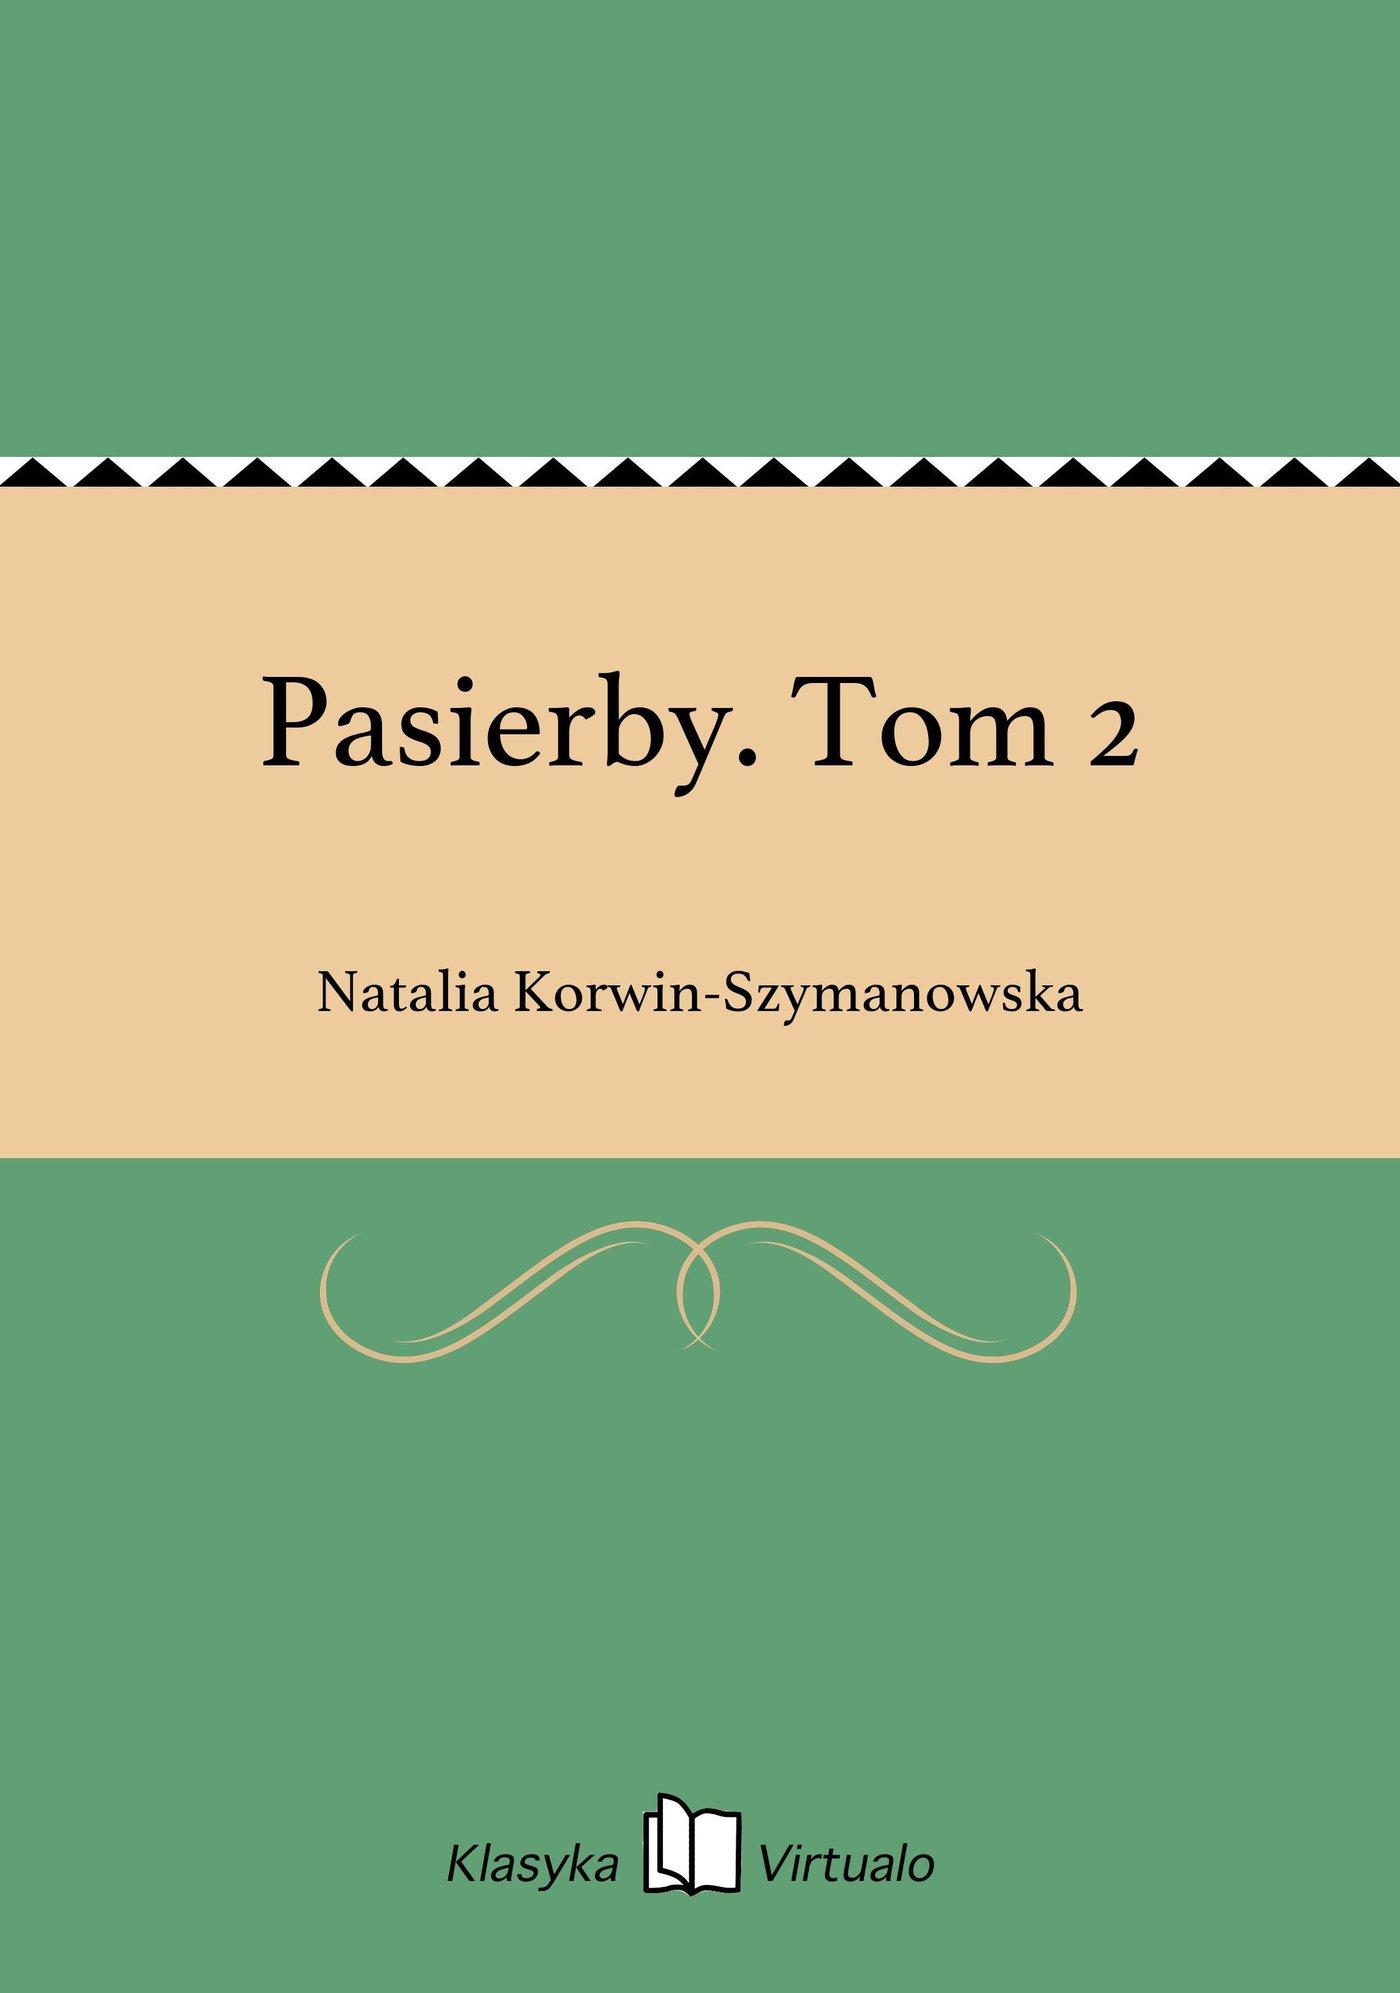 Pasierby. Tom 2 - Ebook (Książka EPUB) do pobrania w formacie EPUB